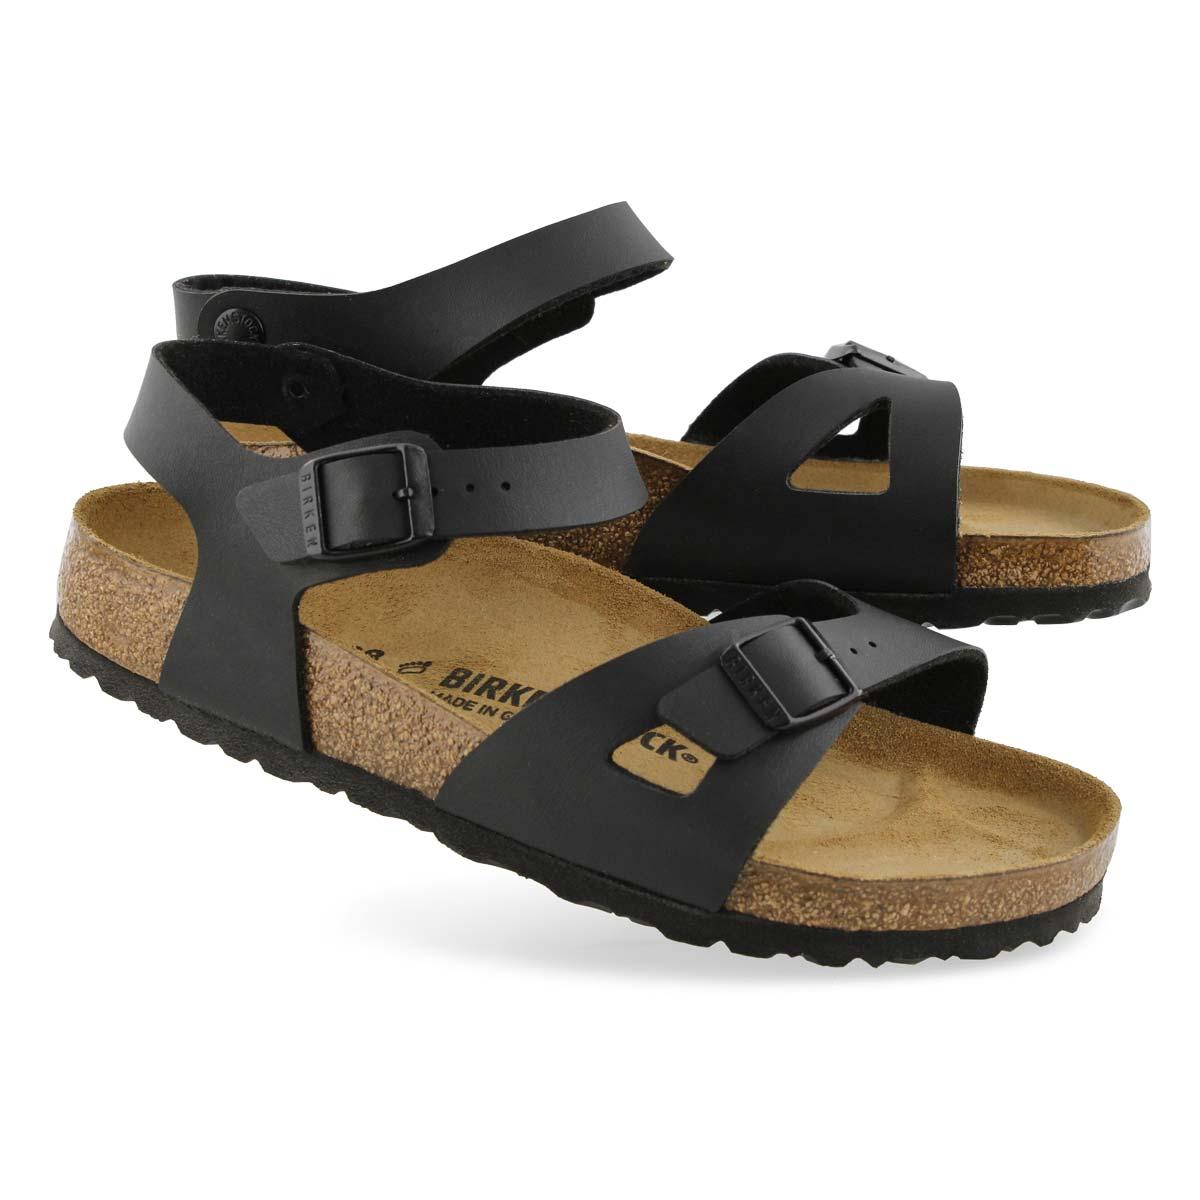 Lds Rio BF black sandal